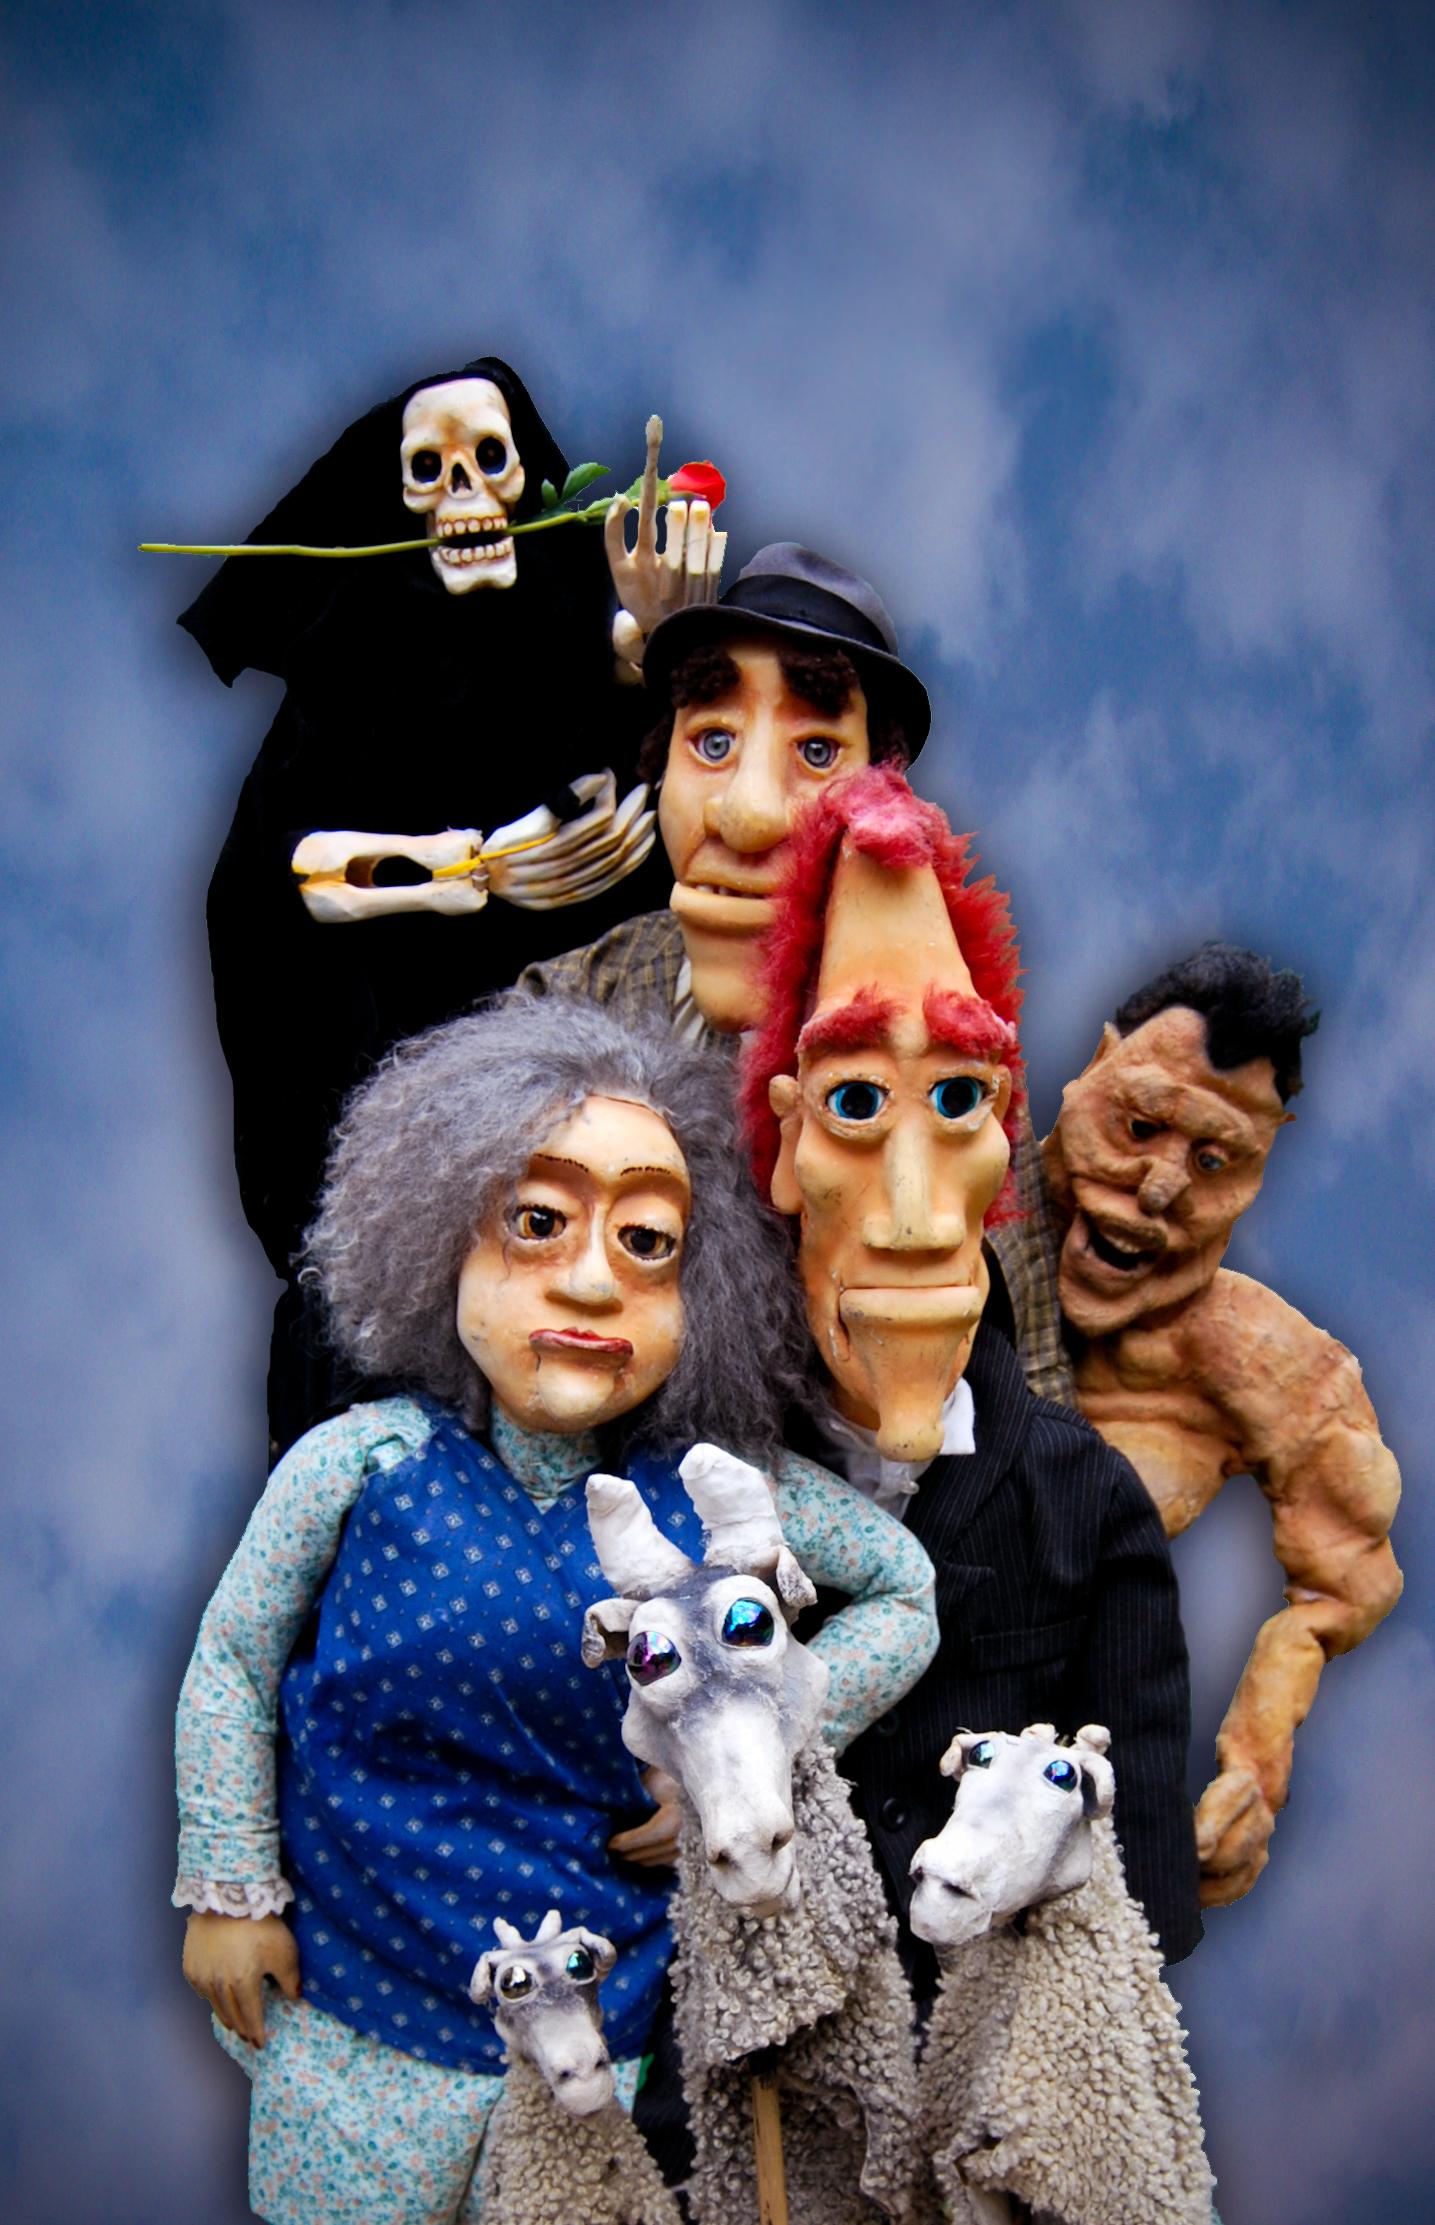 <em>The Variety Show</em> par Thomas Baker de Your Man's Puppets (Galway, Irlande)